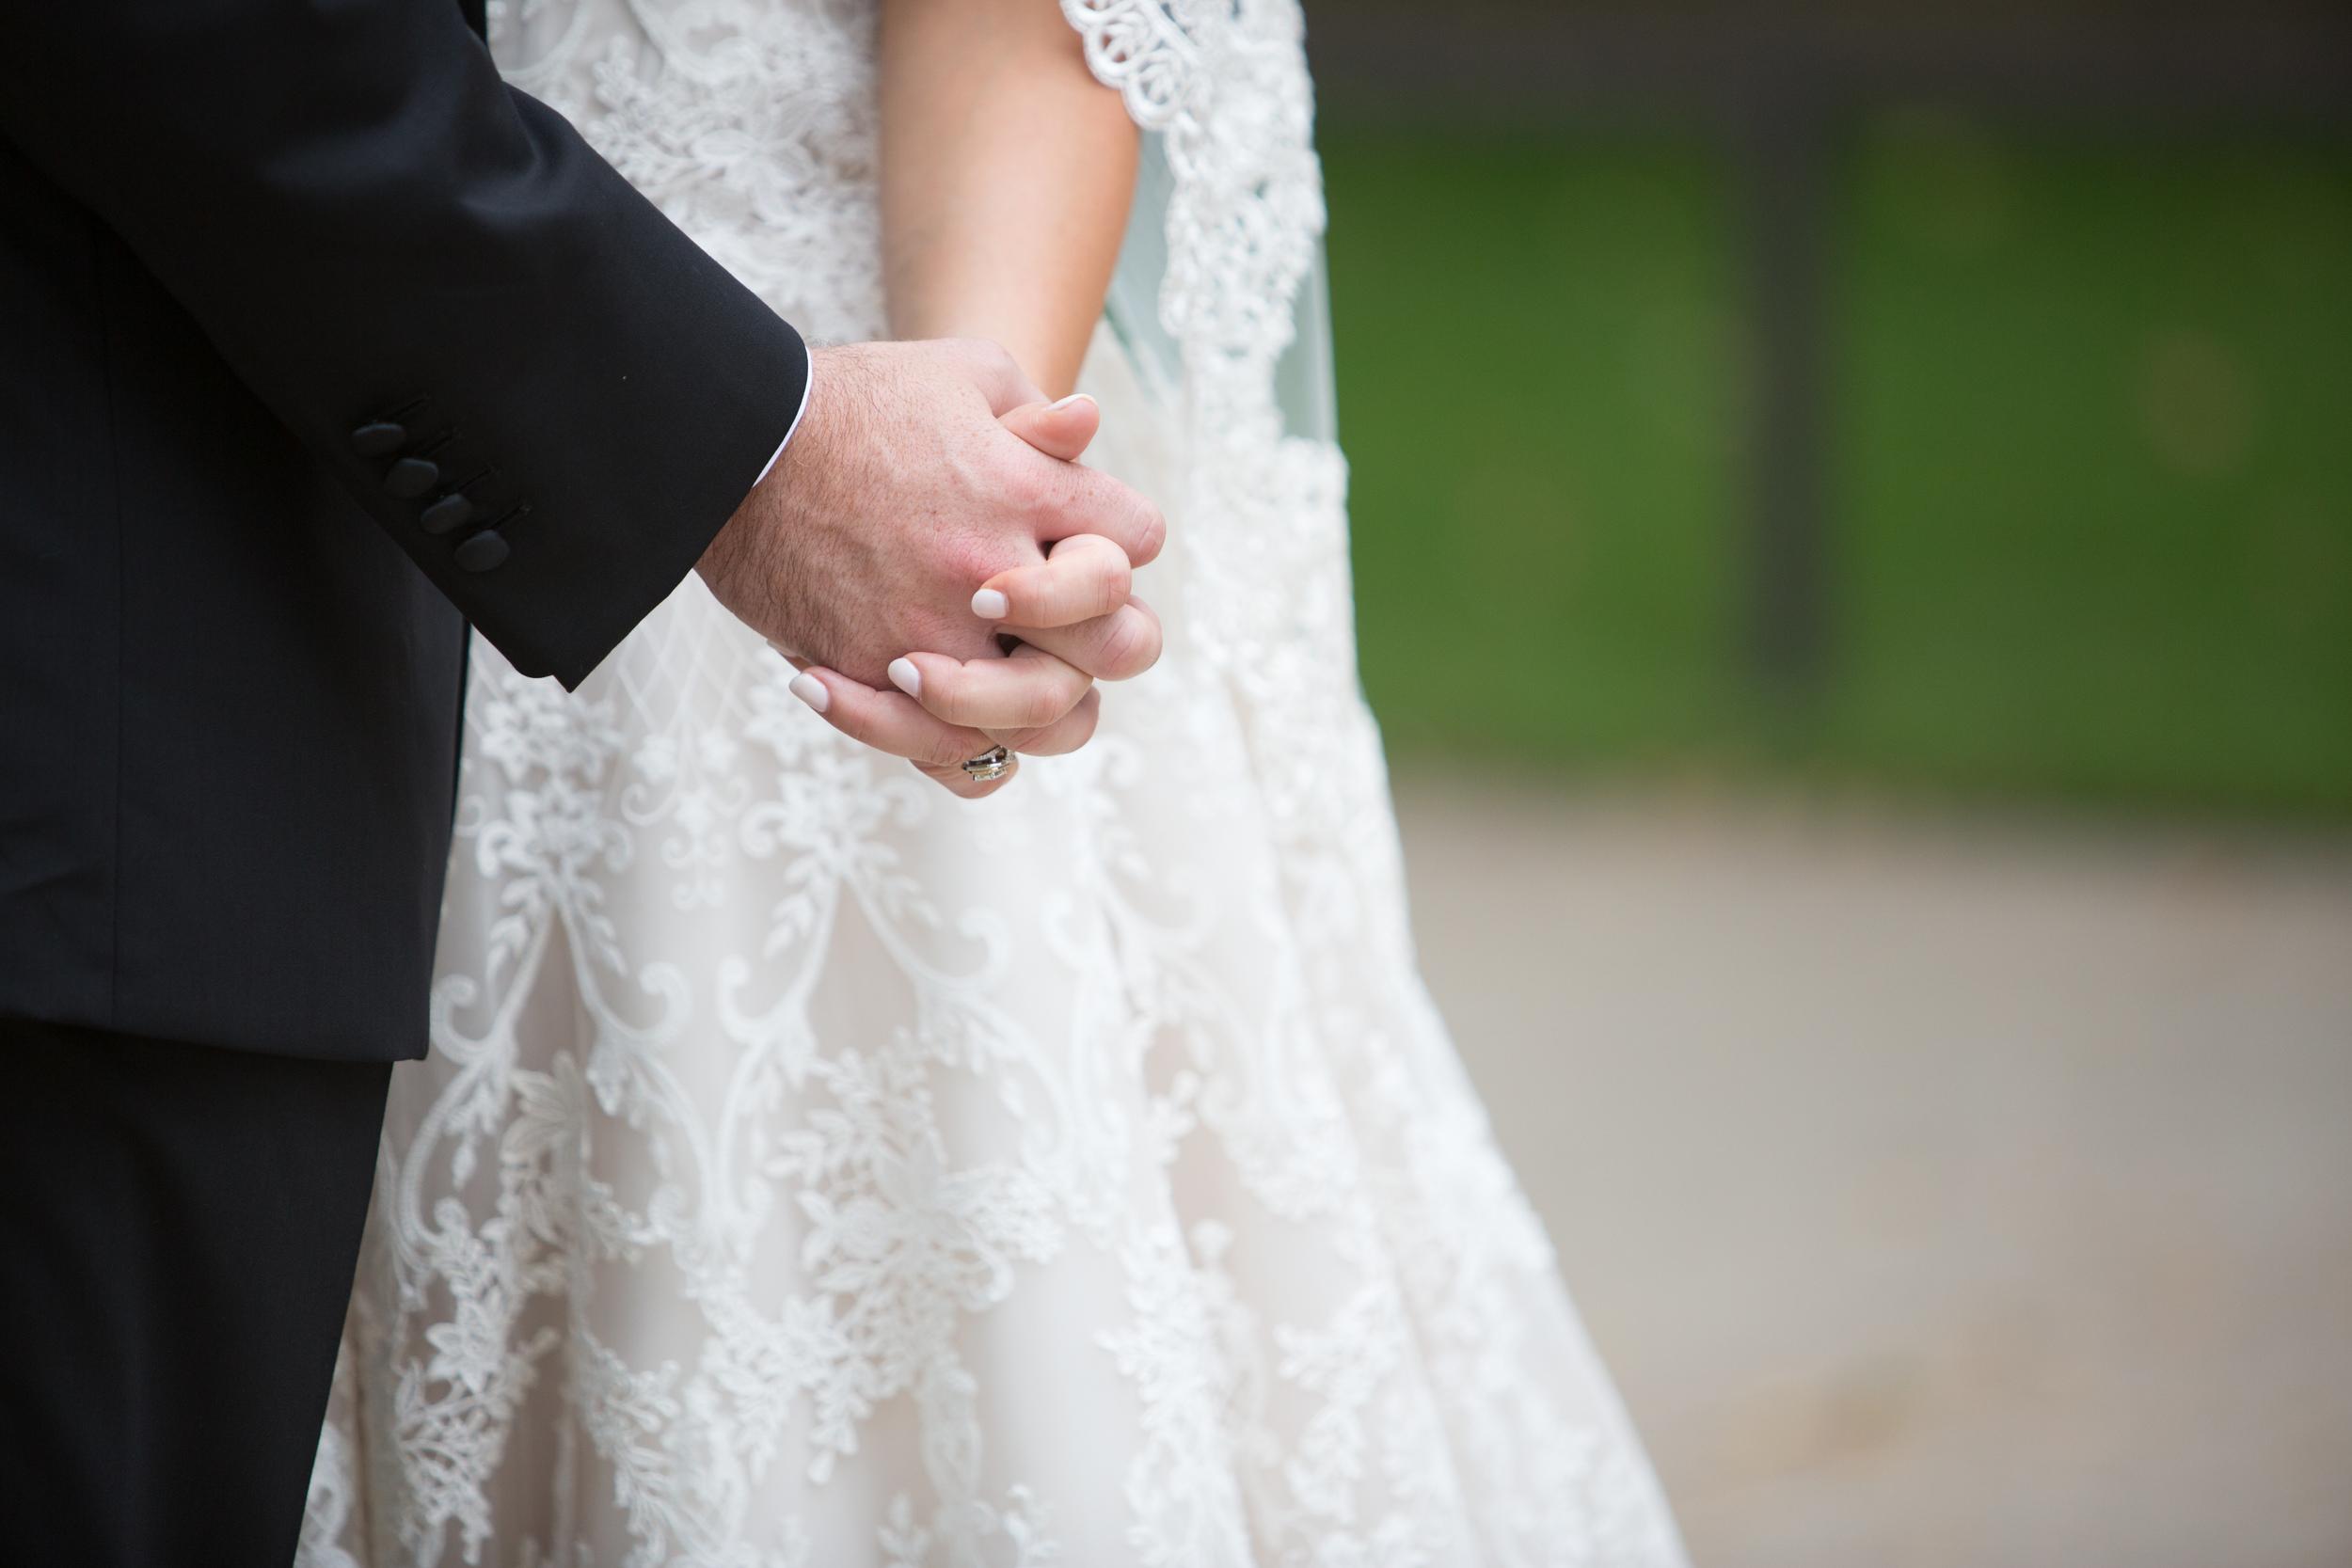 Acowsay_Cinema_MN_Wedding_Holding_hands.jpg